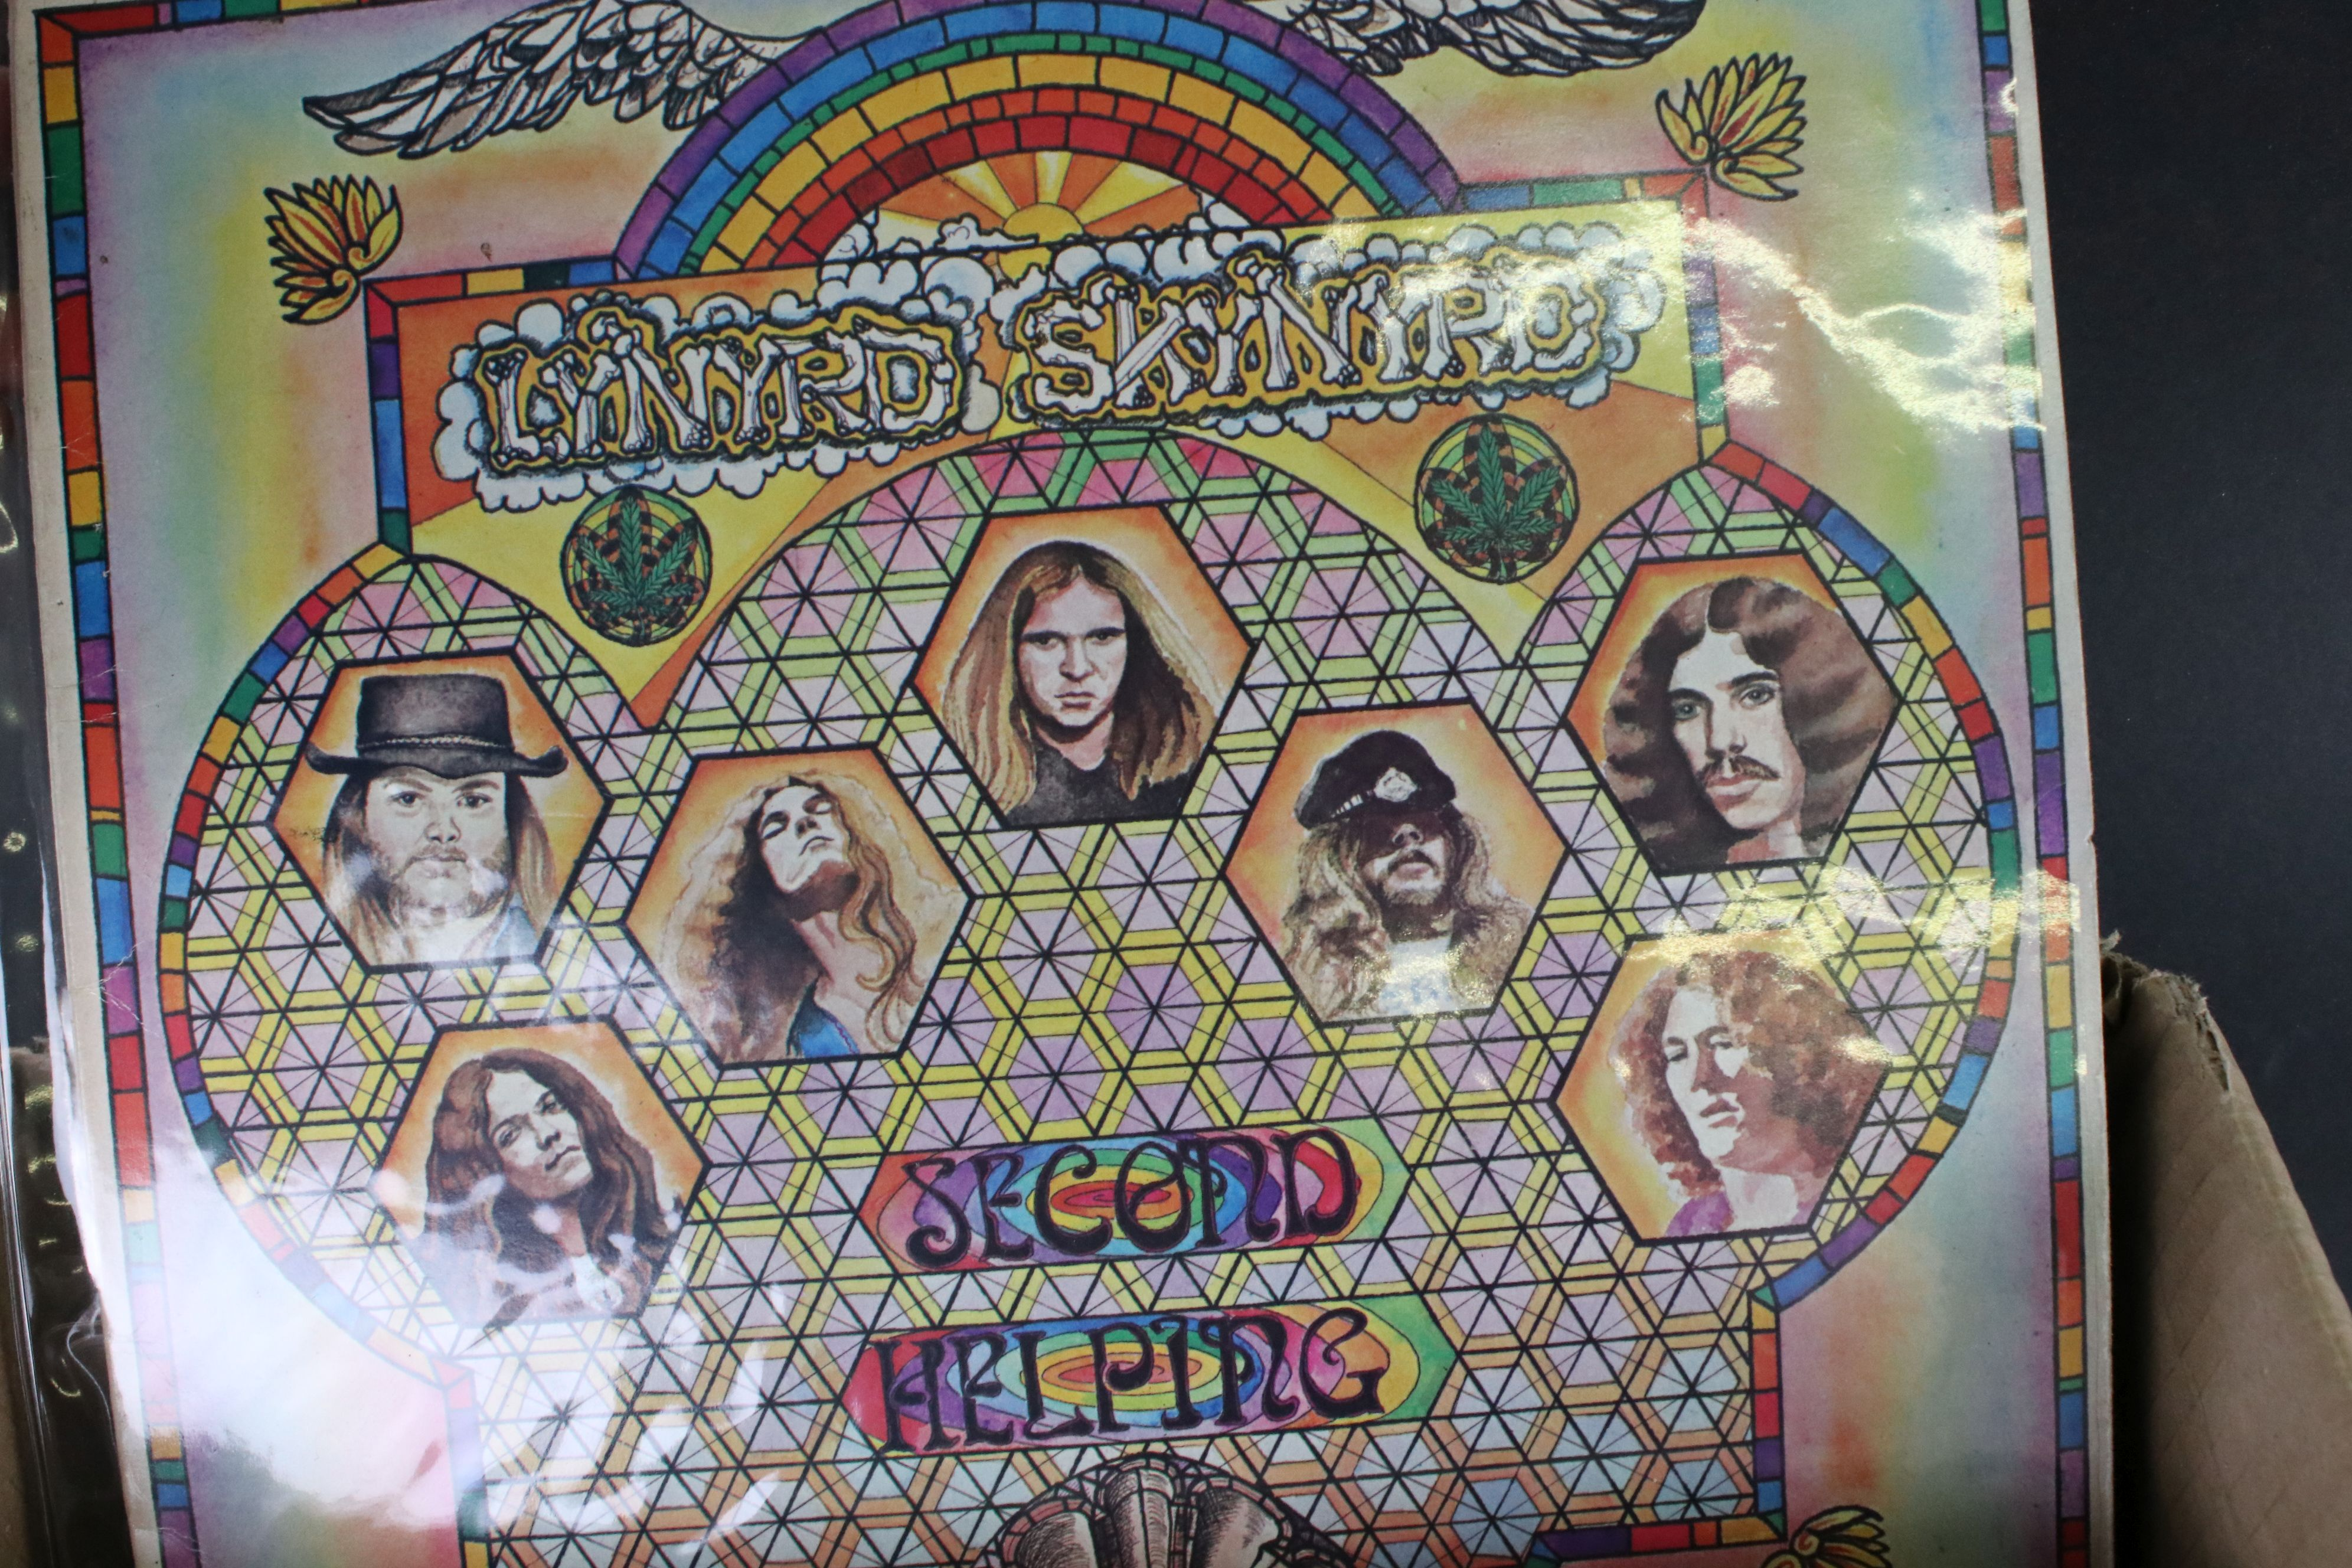 Vinyl - Around 65 US Rock LPs to include Rush, Todd Rundgren, Kiss, Steeley Dan, Lone Star etc, - Image 9 of 9